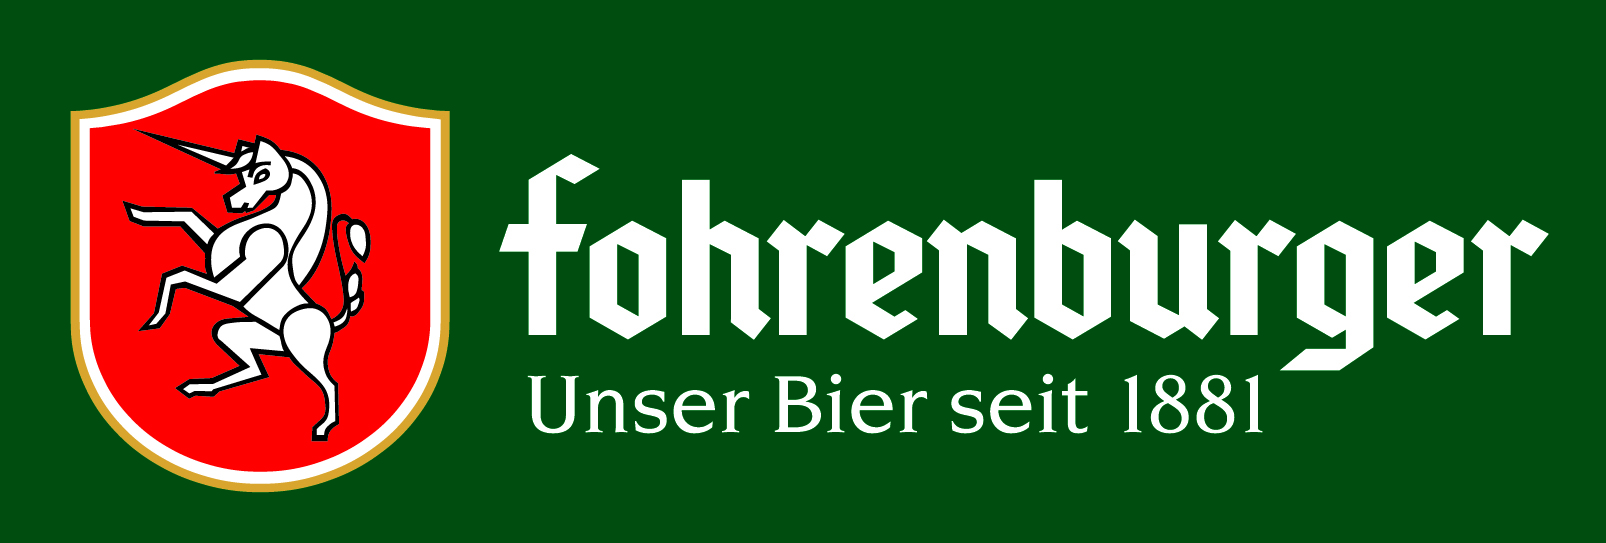 Sponsor Fohrenburger